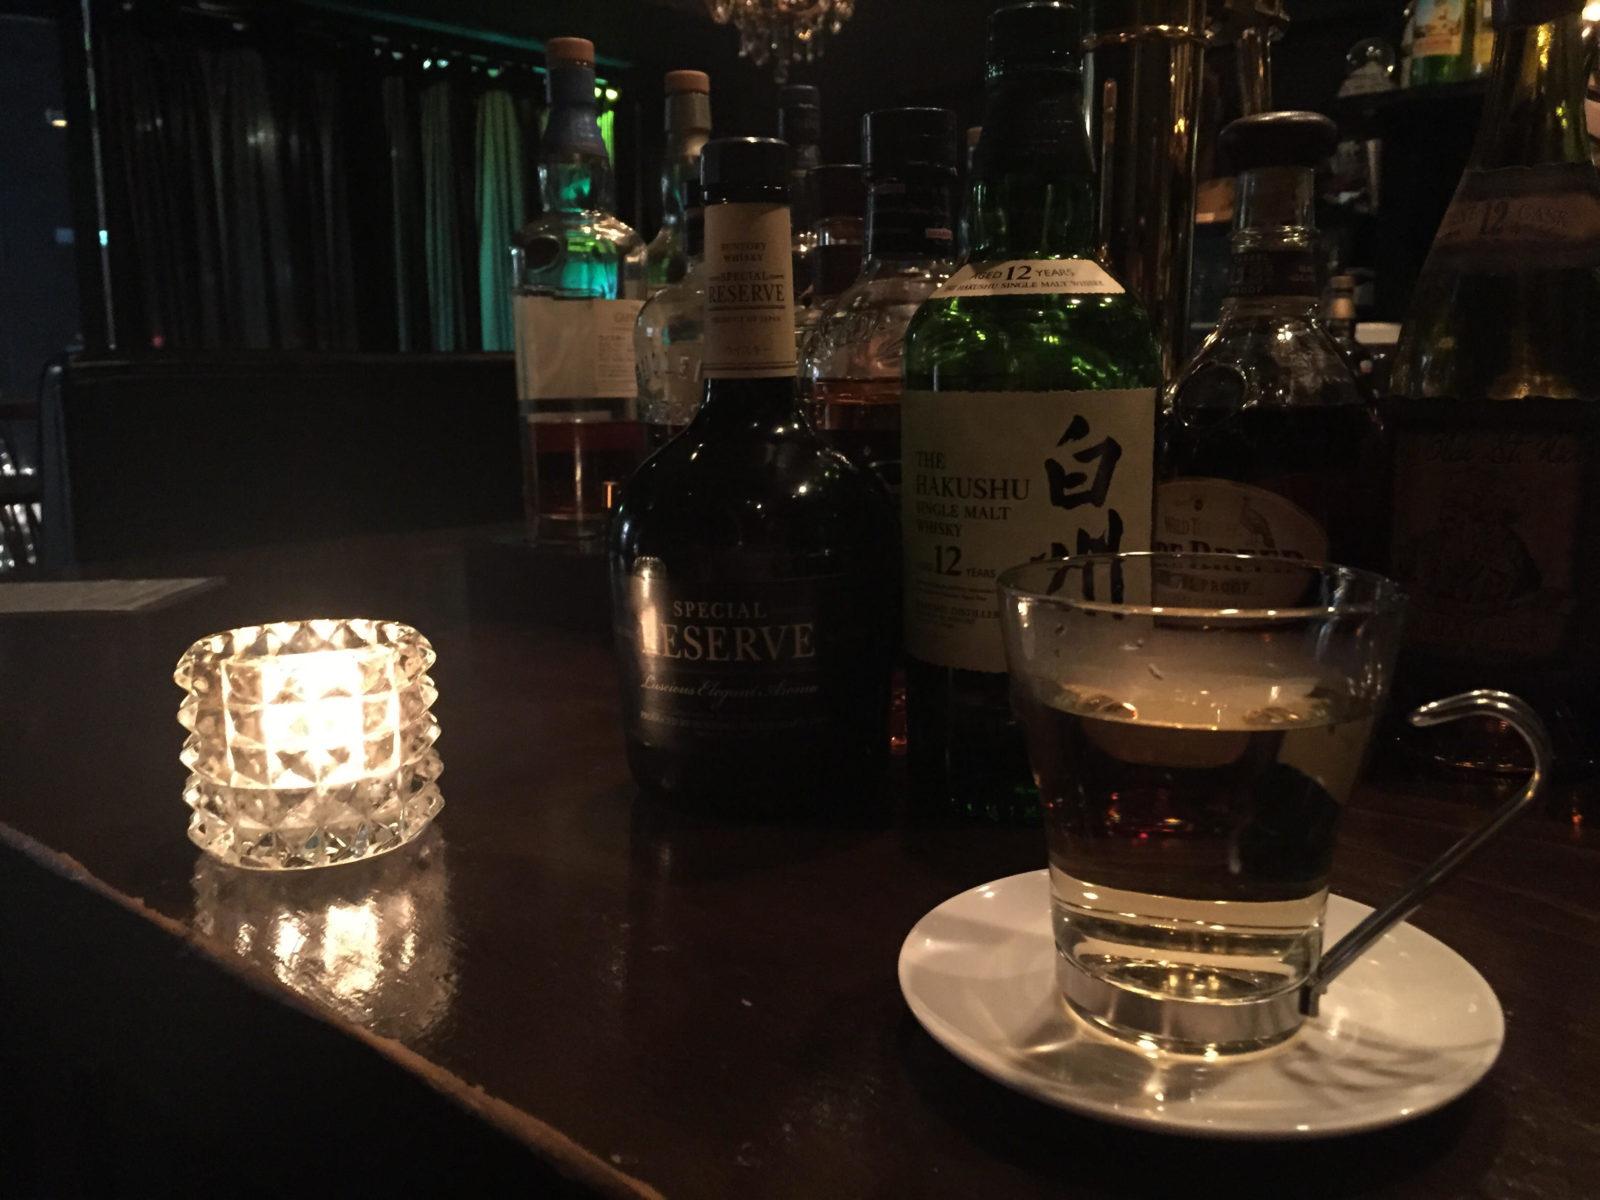 Suntory Reserve Bartender's choice